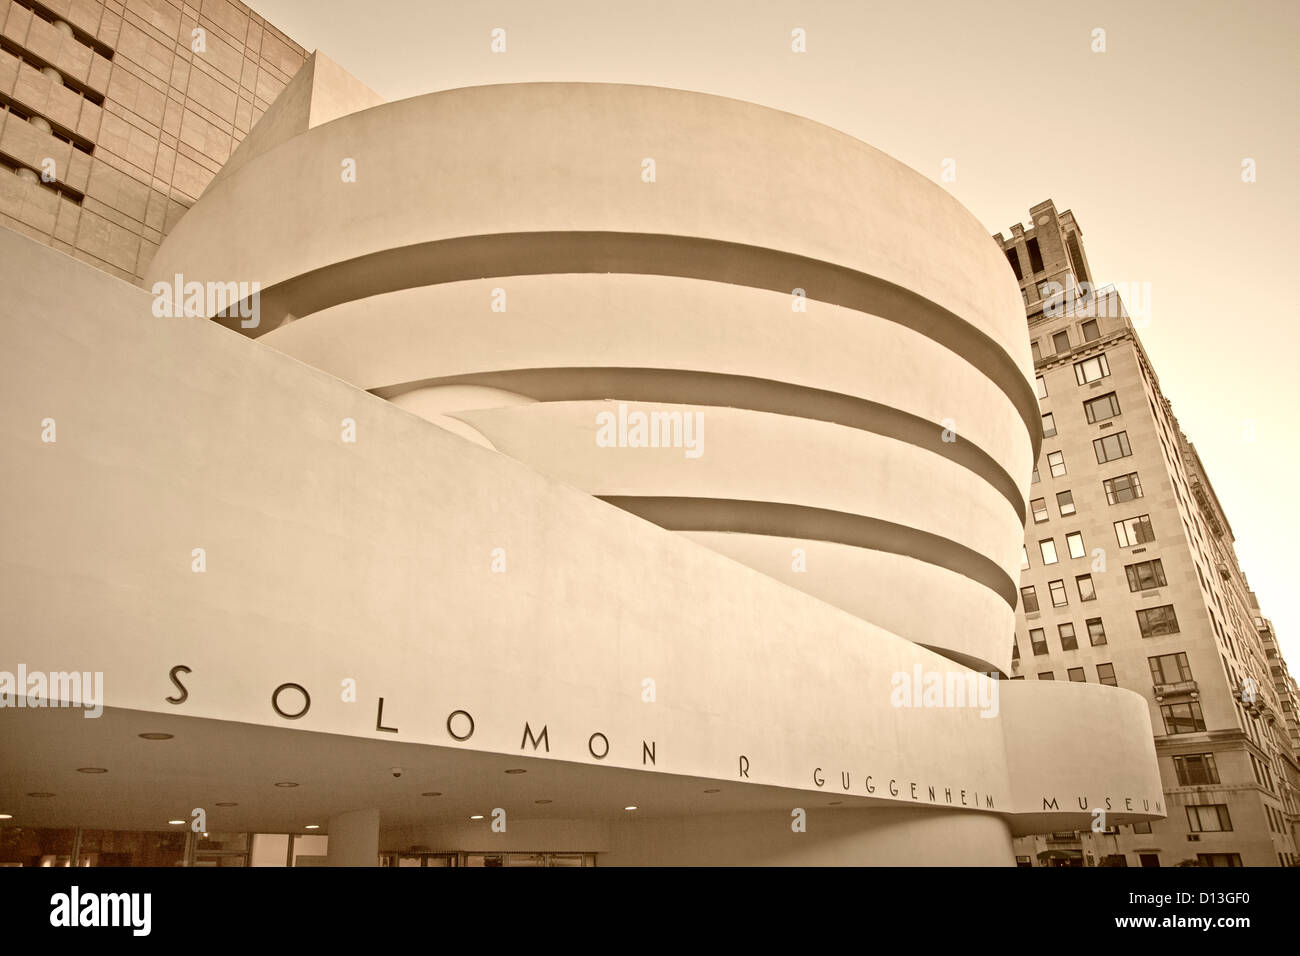 Solomon R Guggenheim Musuem, Manhattan, New York - Stock Image